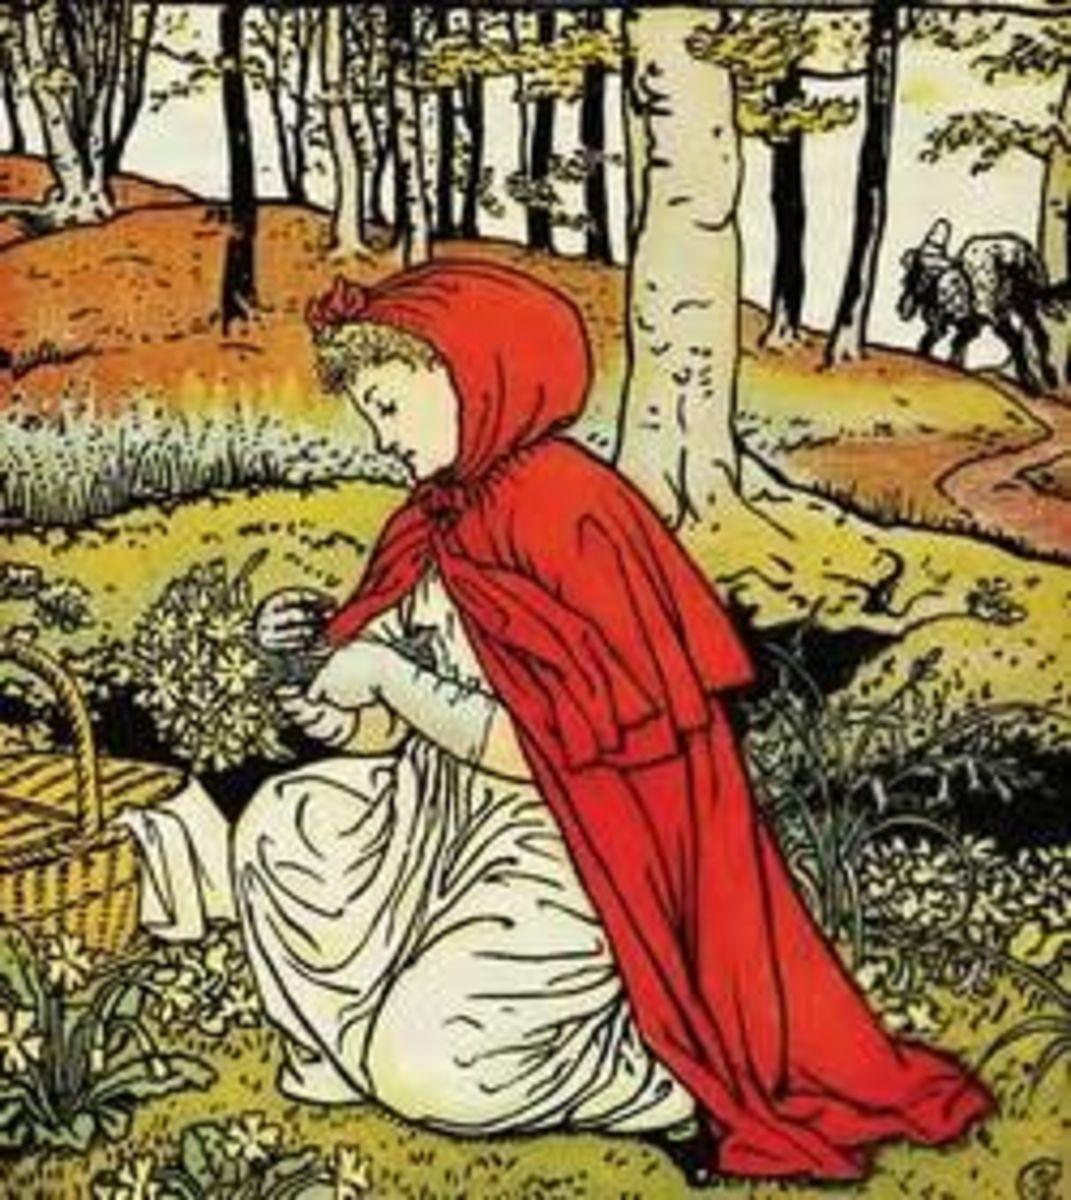 Great example of heroine in fairy tales